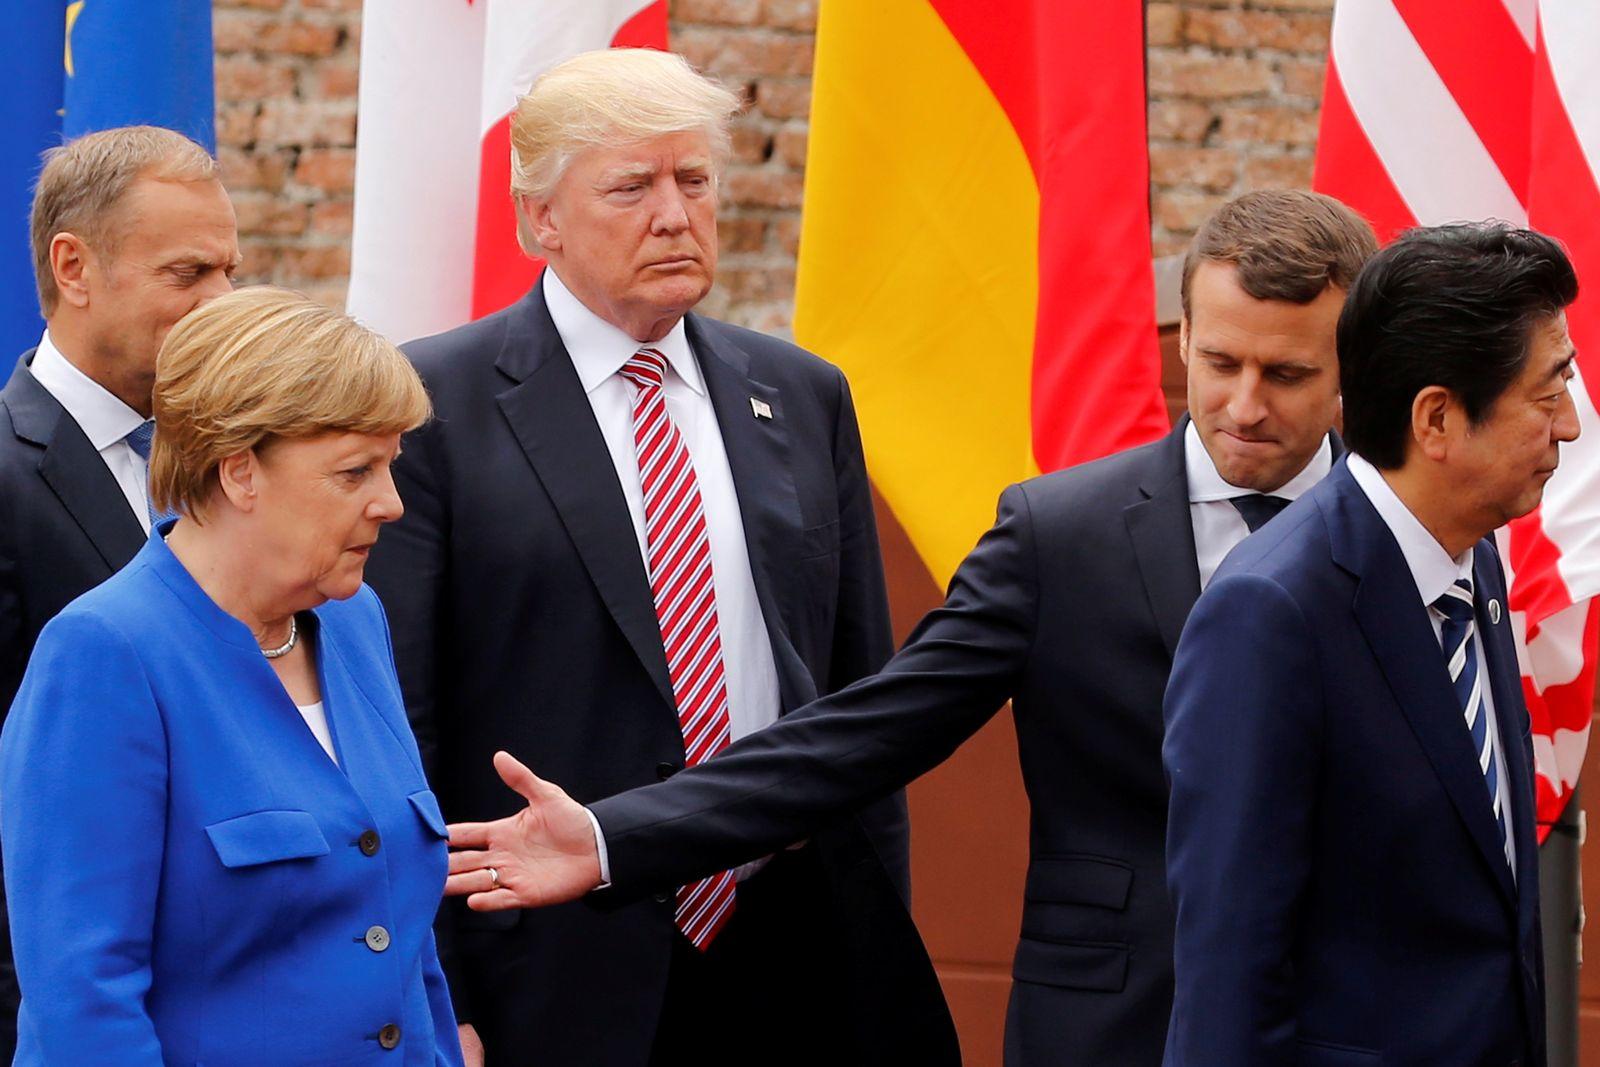 Merkel, U.S. President Donald Trump, French President Emmanuel Macron